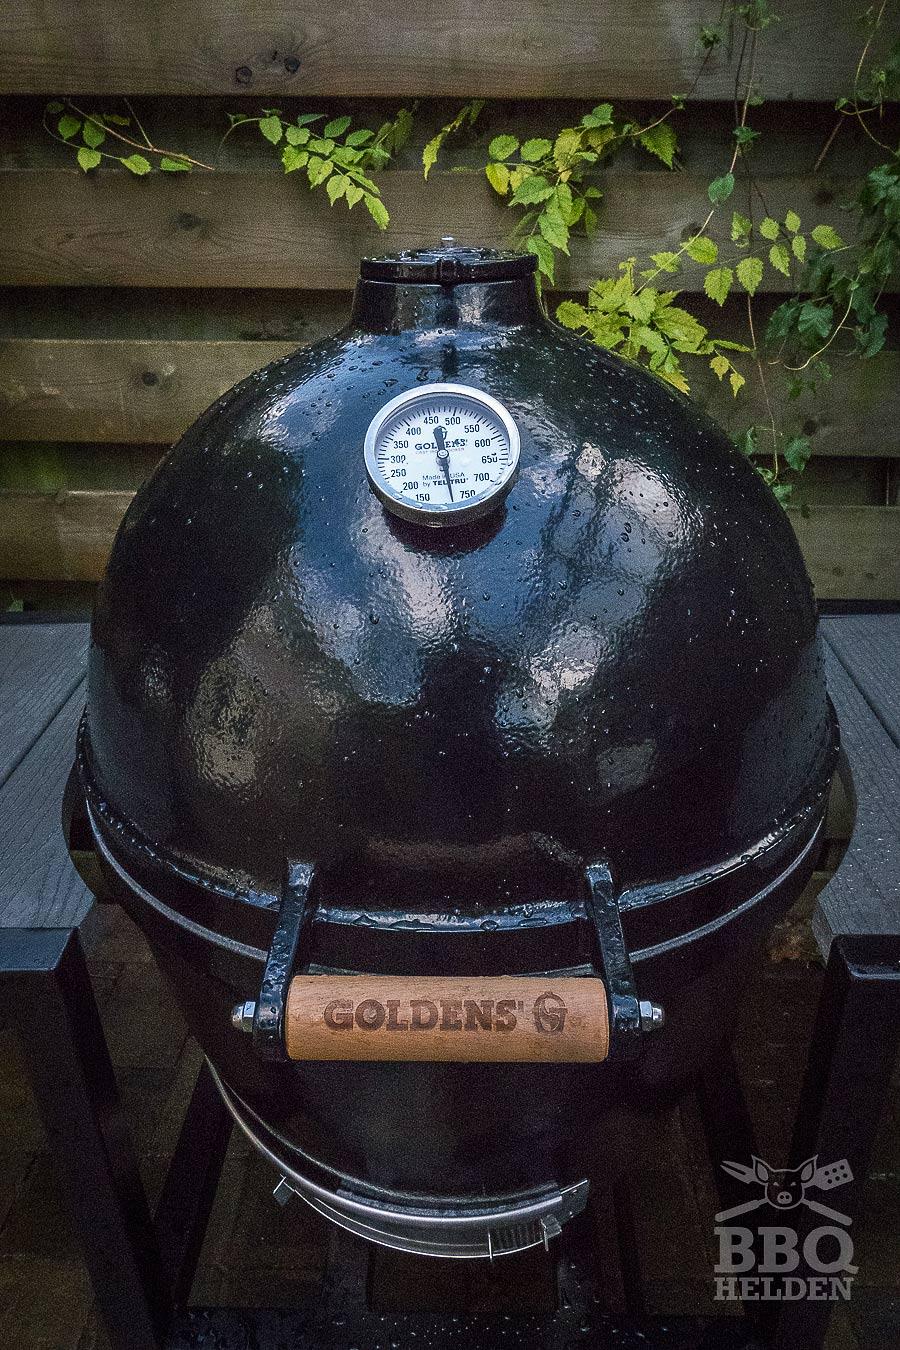 BBQ brand ijzer – BBQ helden